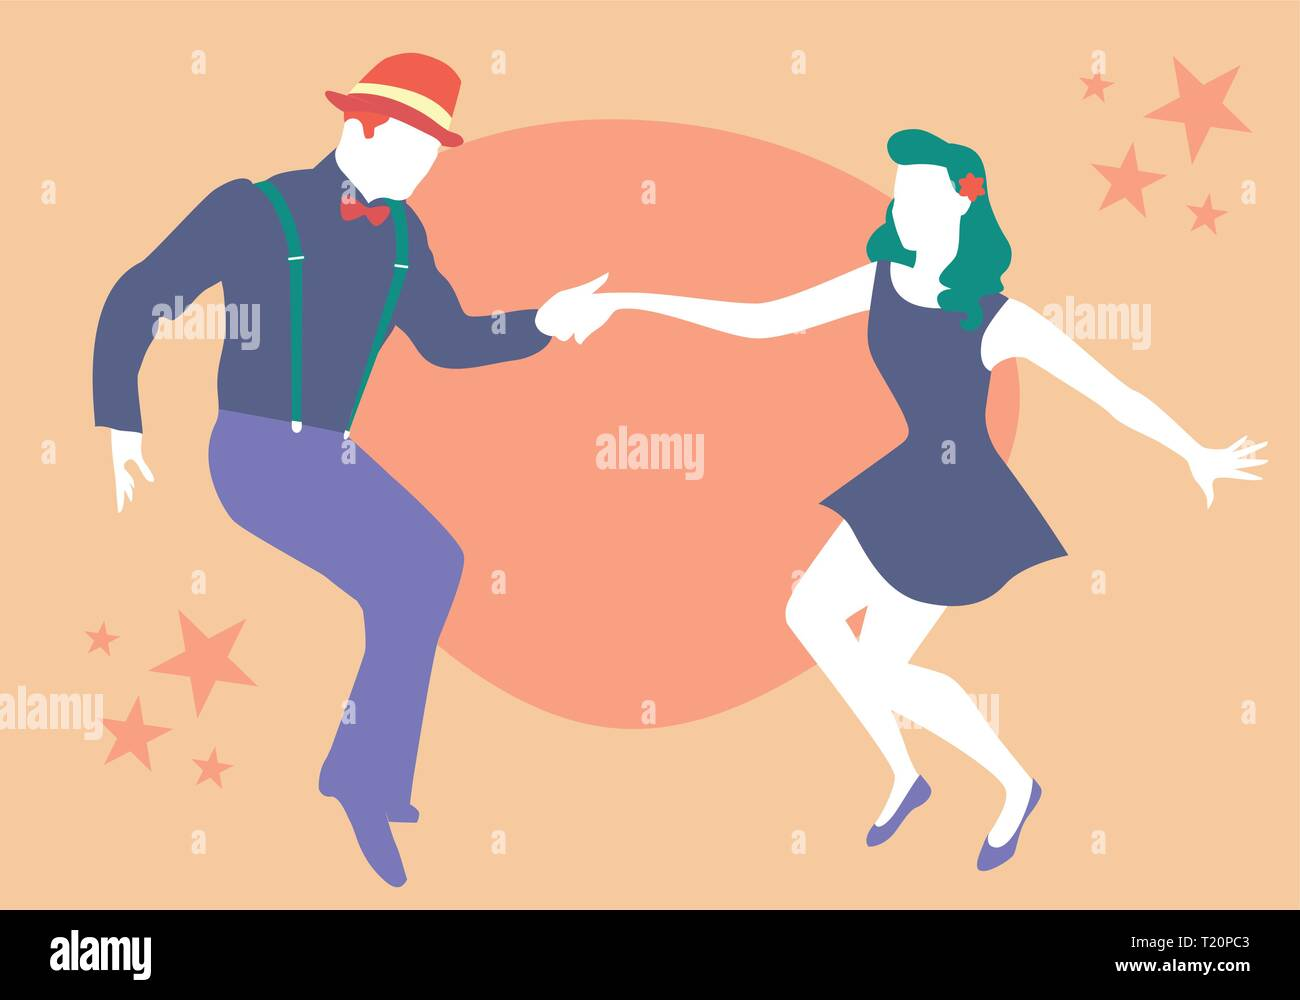 Young couple dancing swing, rock or lindy hop - Stock Vector